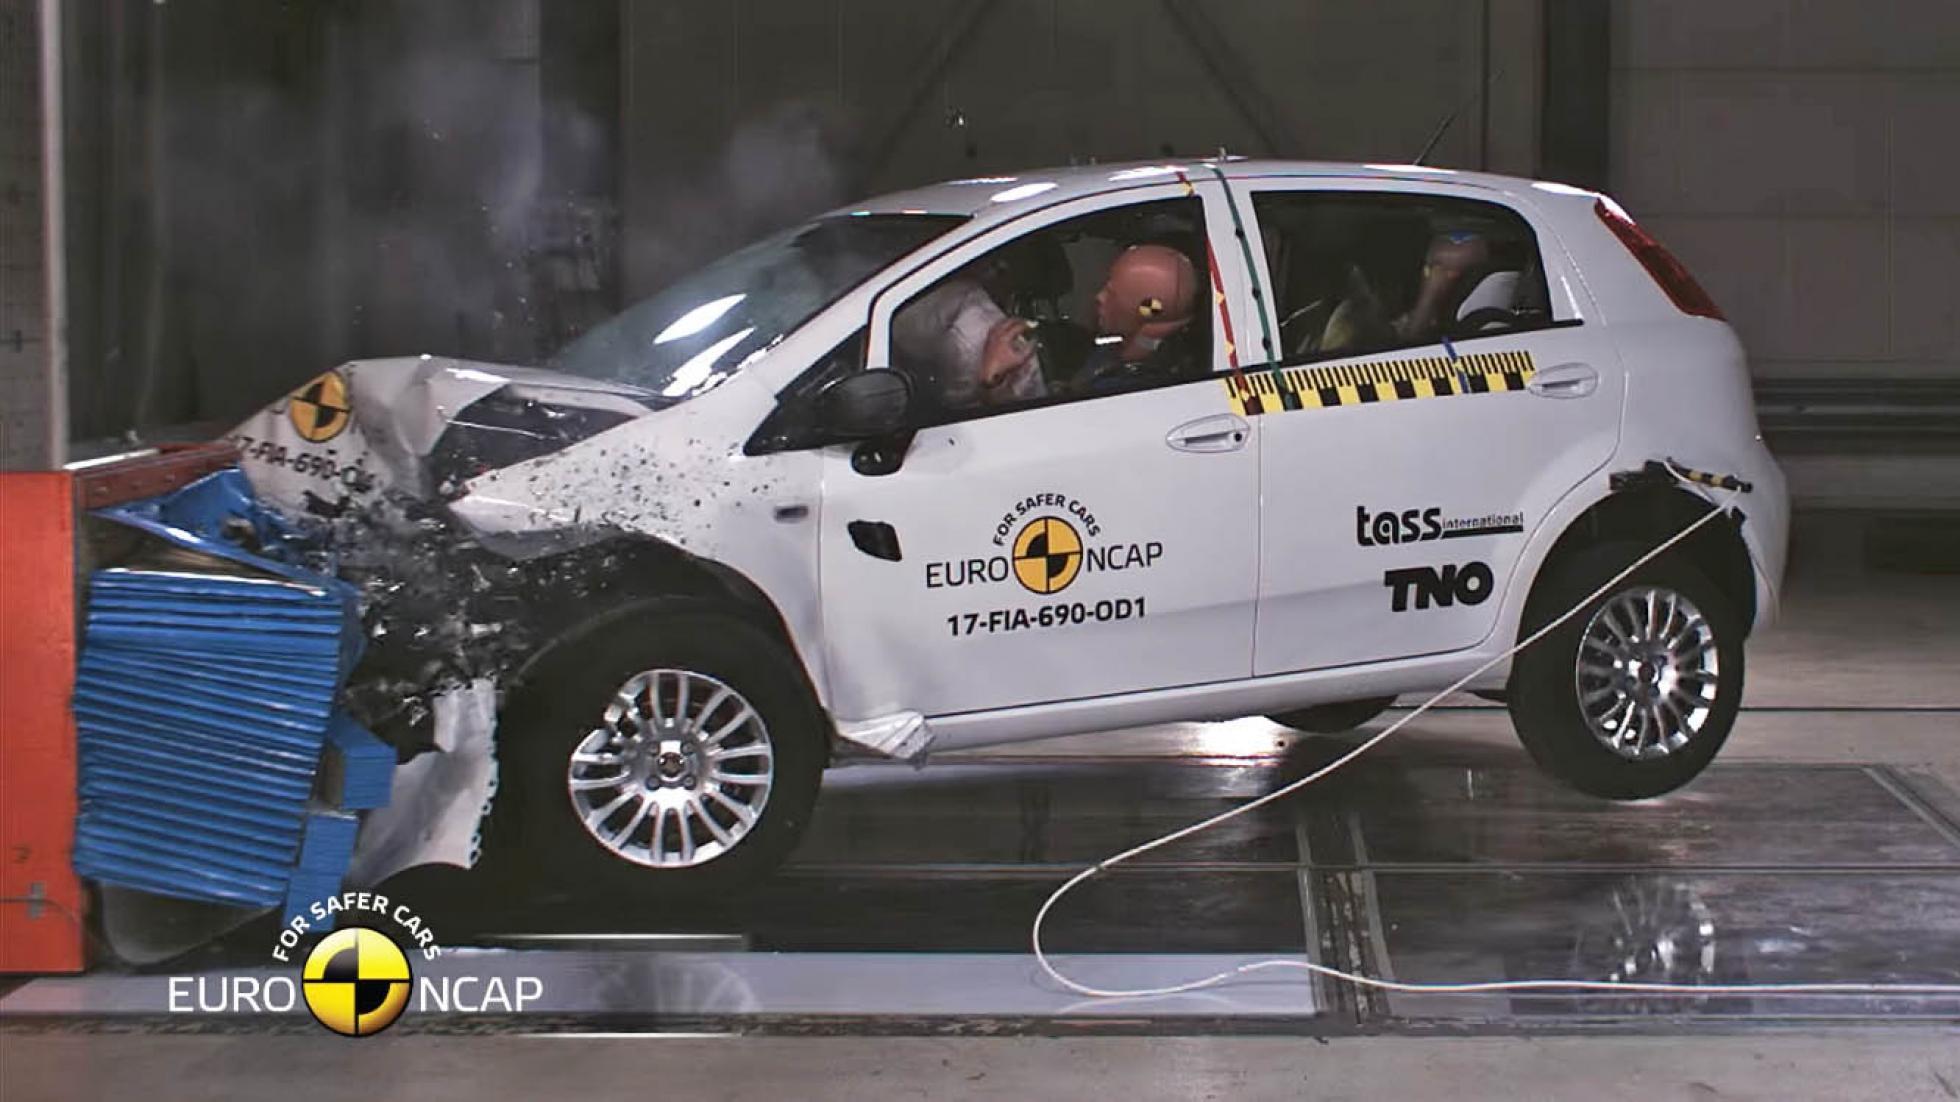 The Fiat Punto score zero NCAP stars